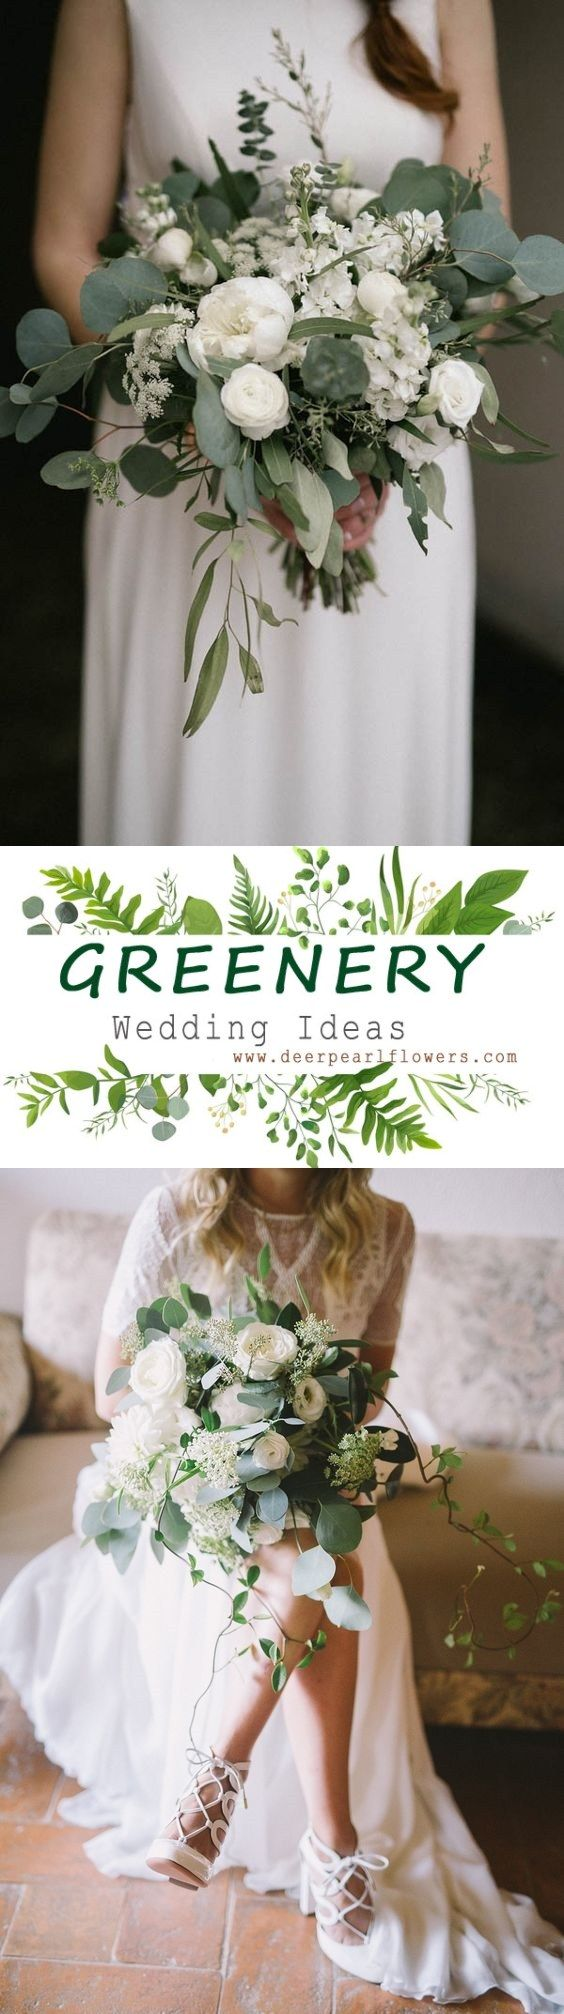 wedding trends greenery wedding decor ideas colorful